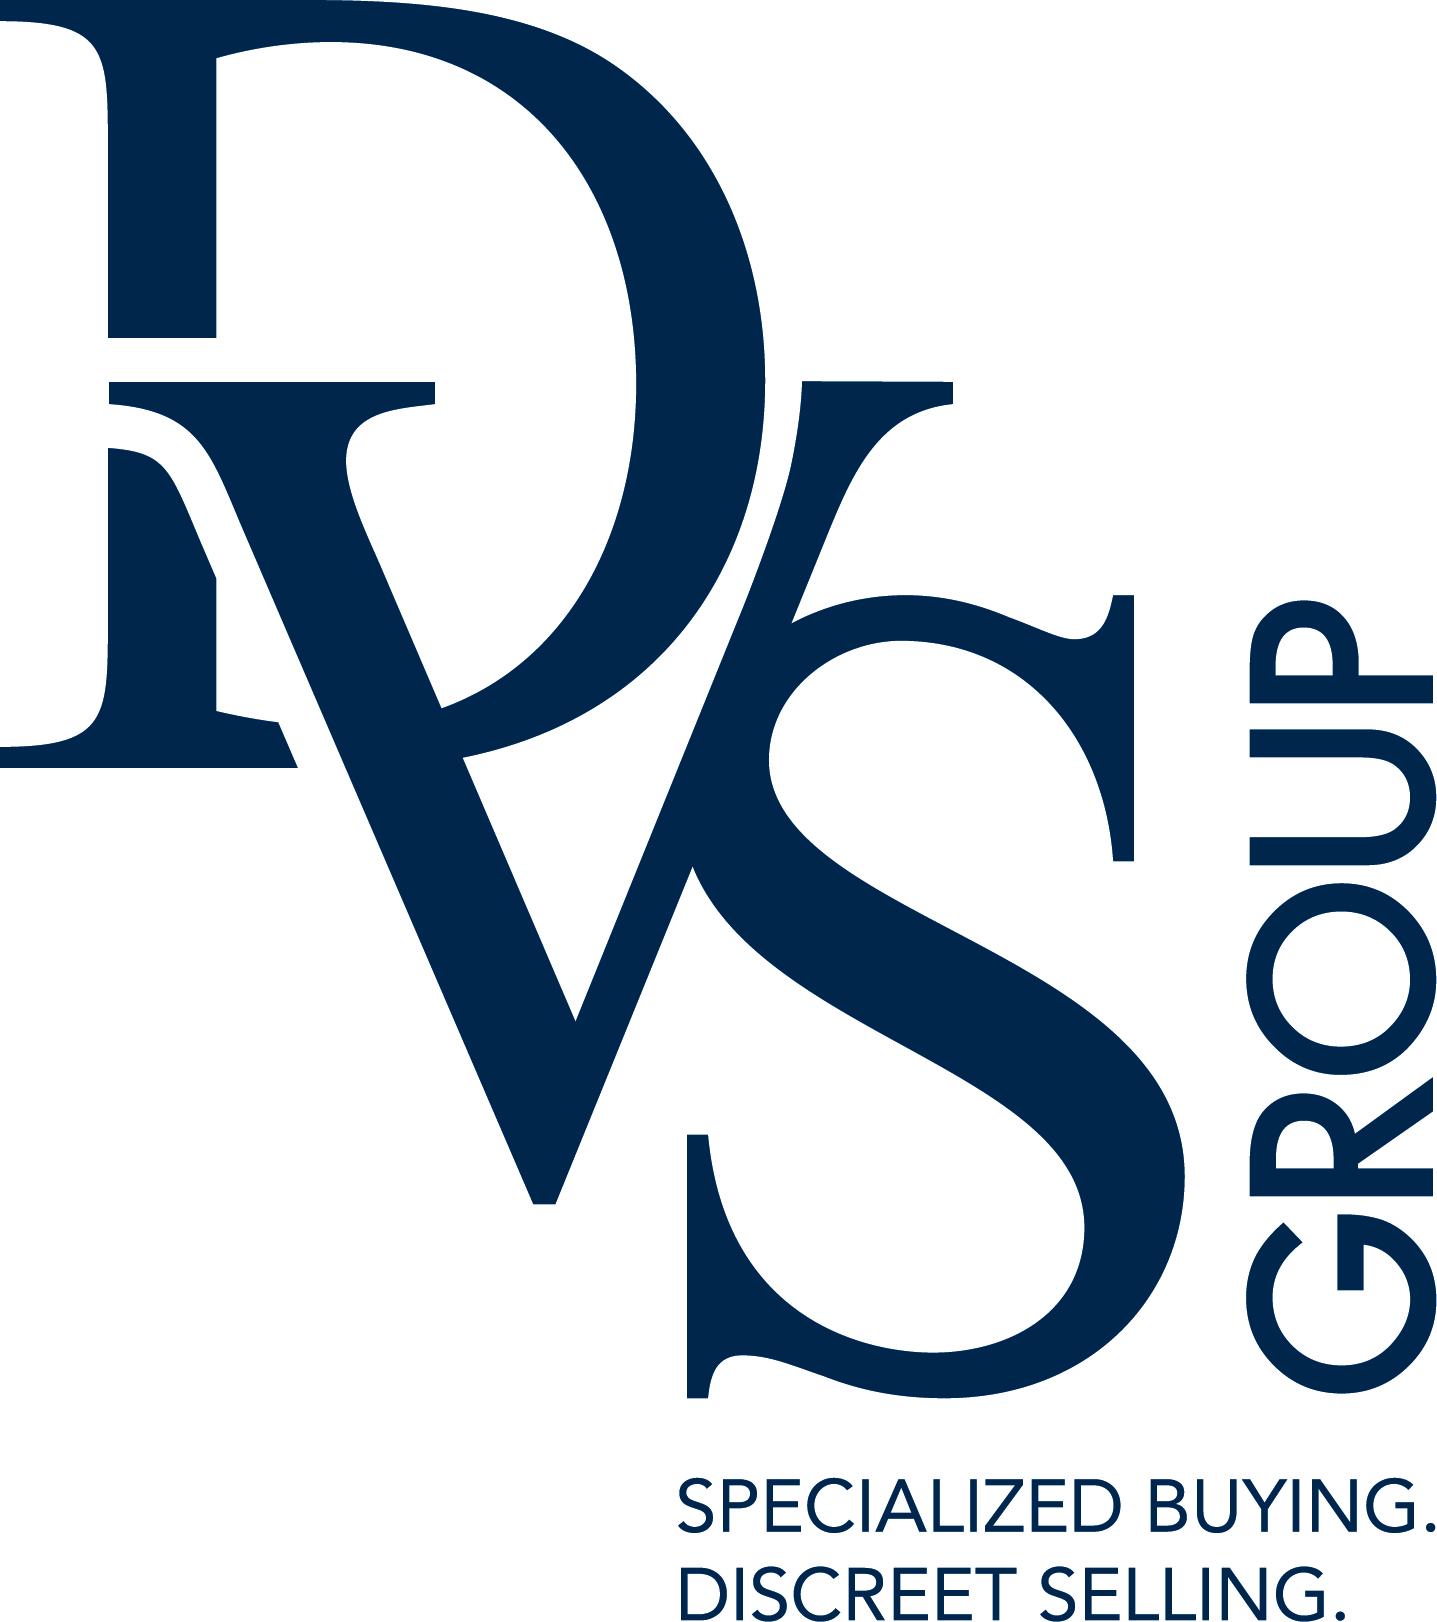 dvs group logo